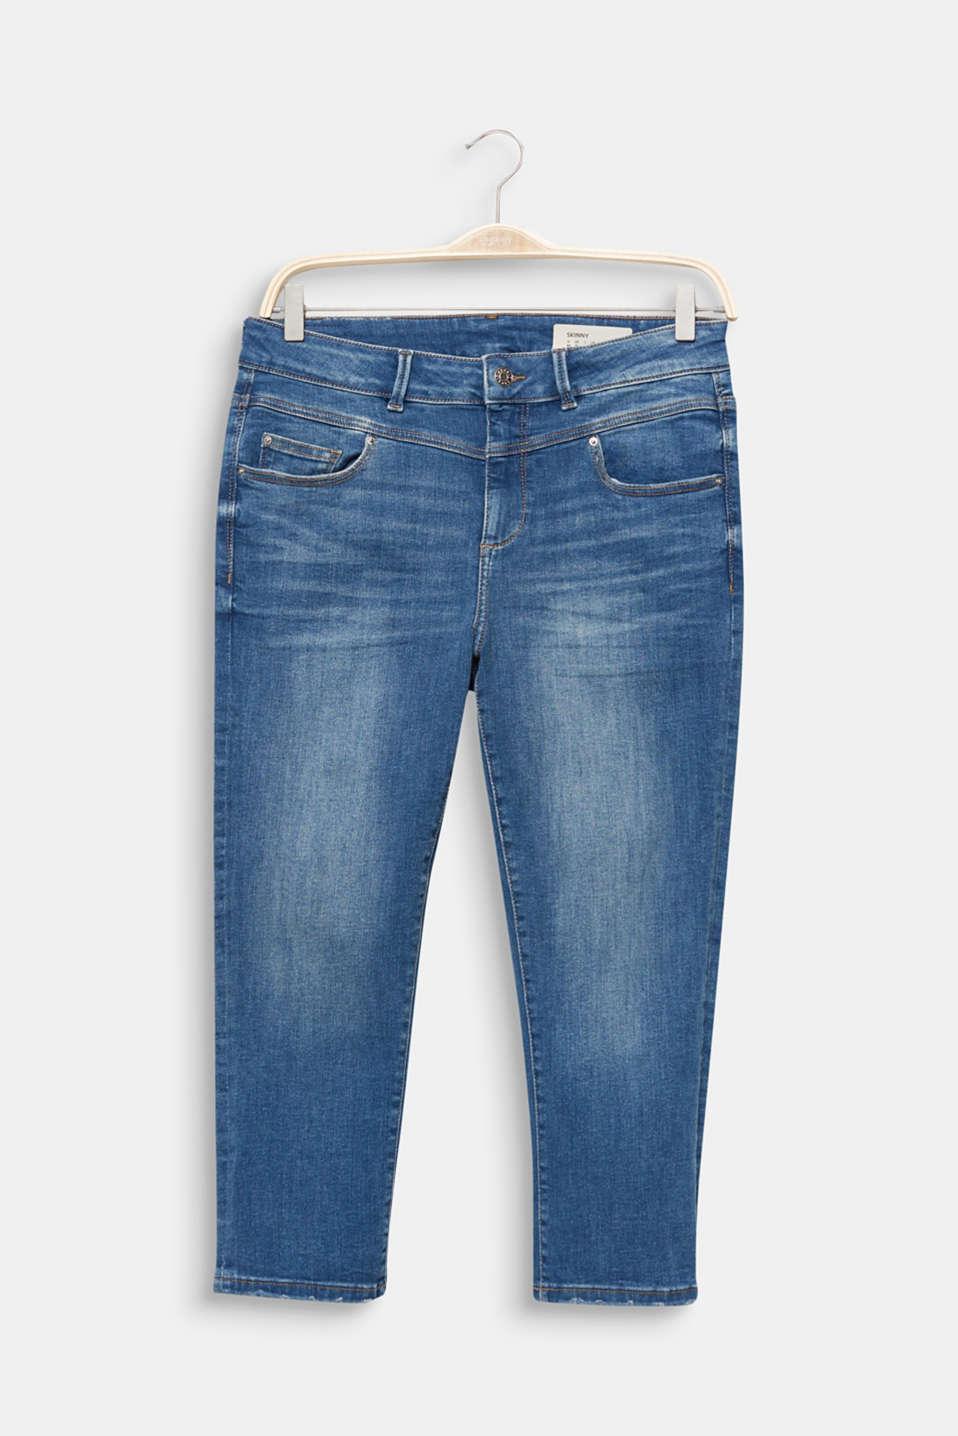 CURVY stretch capris jeans, BLUE MEDIUM WASH, detail image number 7